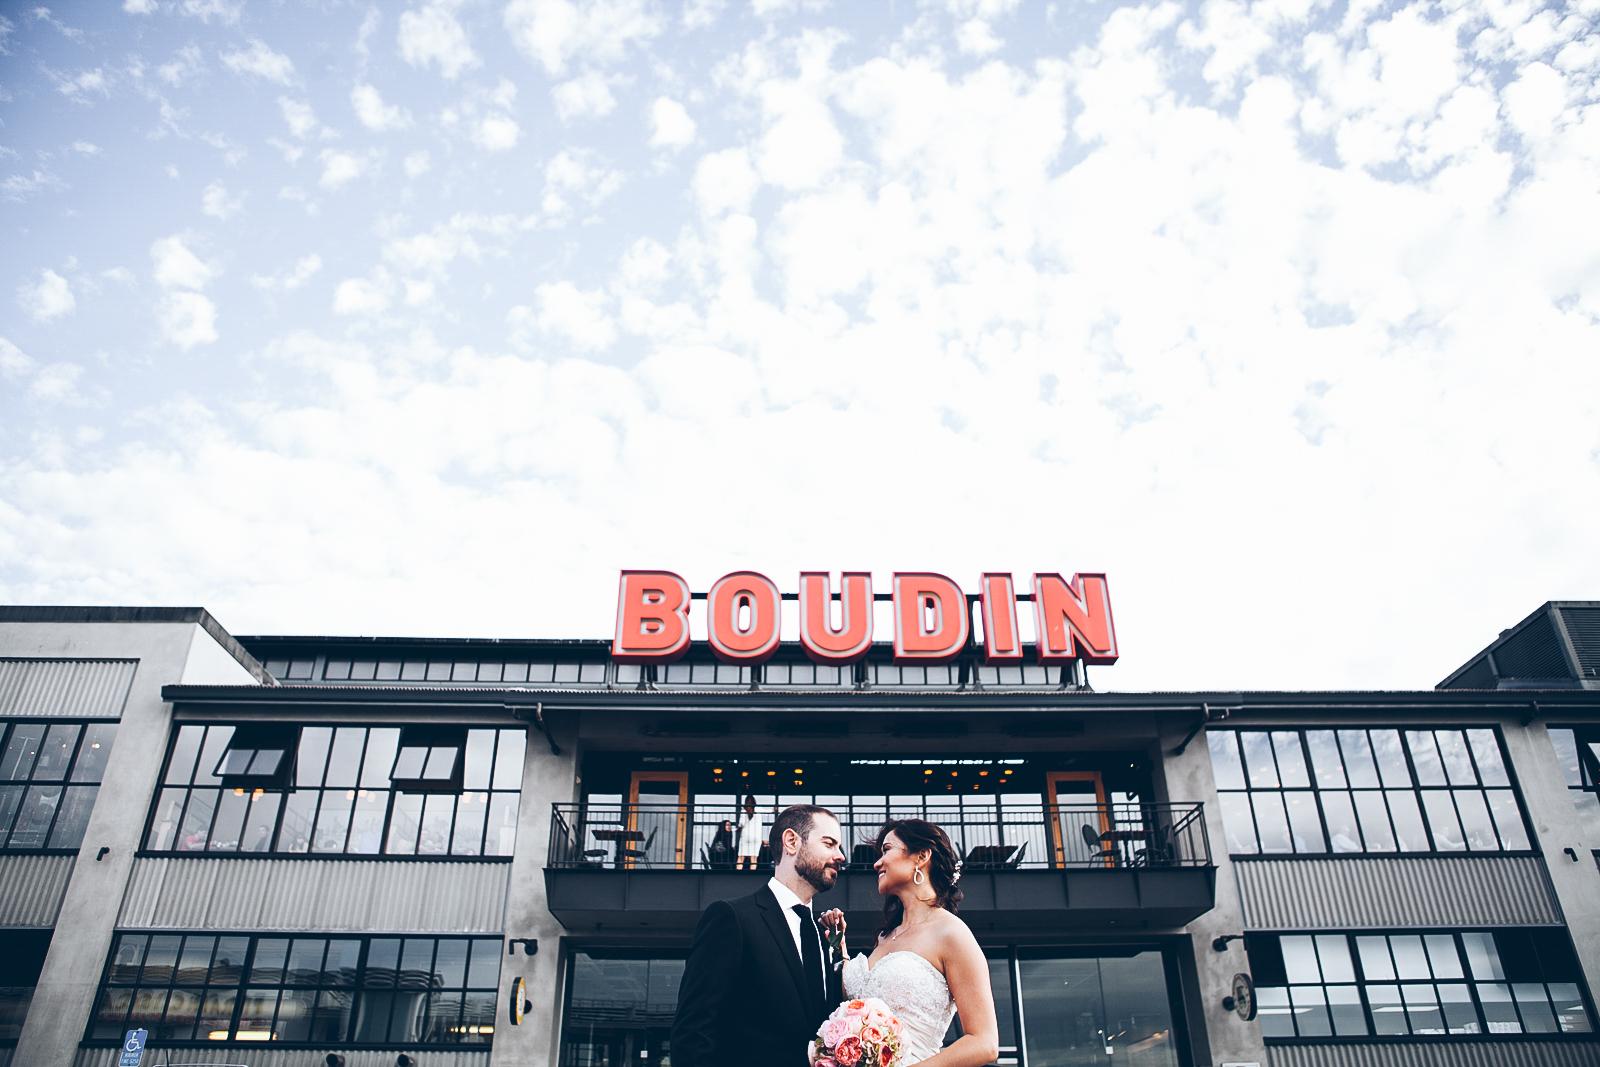 San_francisco_city_hall_wedding_photography_meegan_travis_ebony_siovhan_bokeh_photography_69.jpg